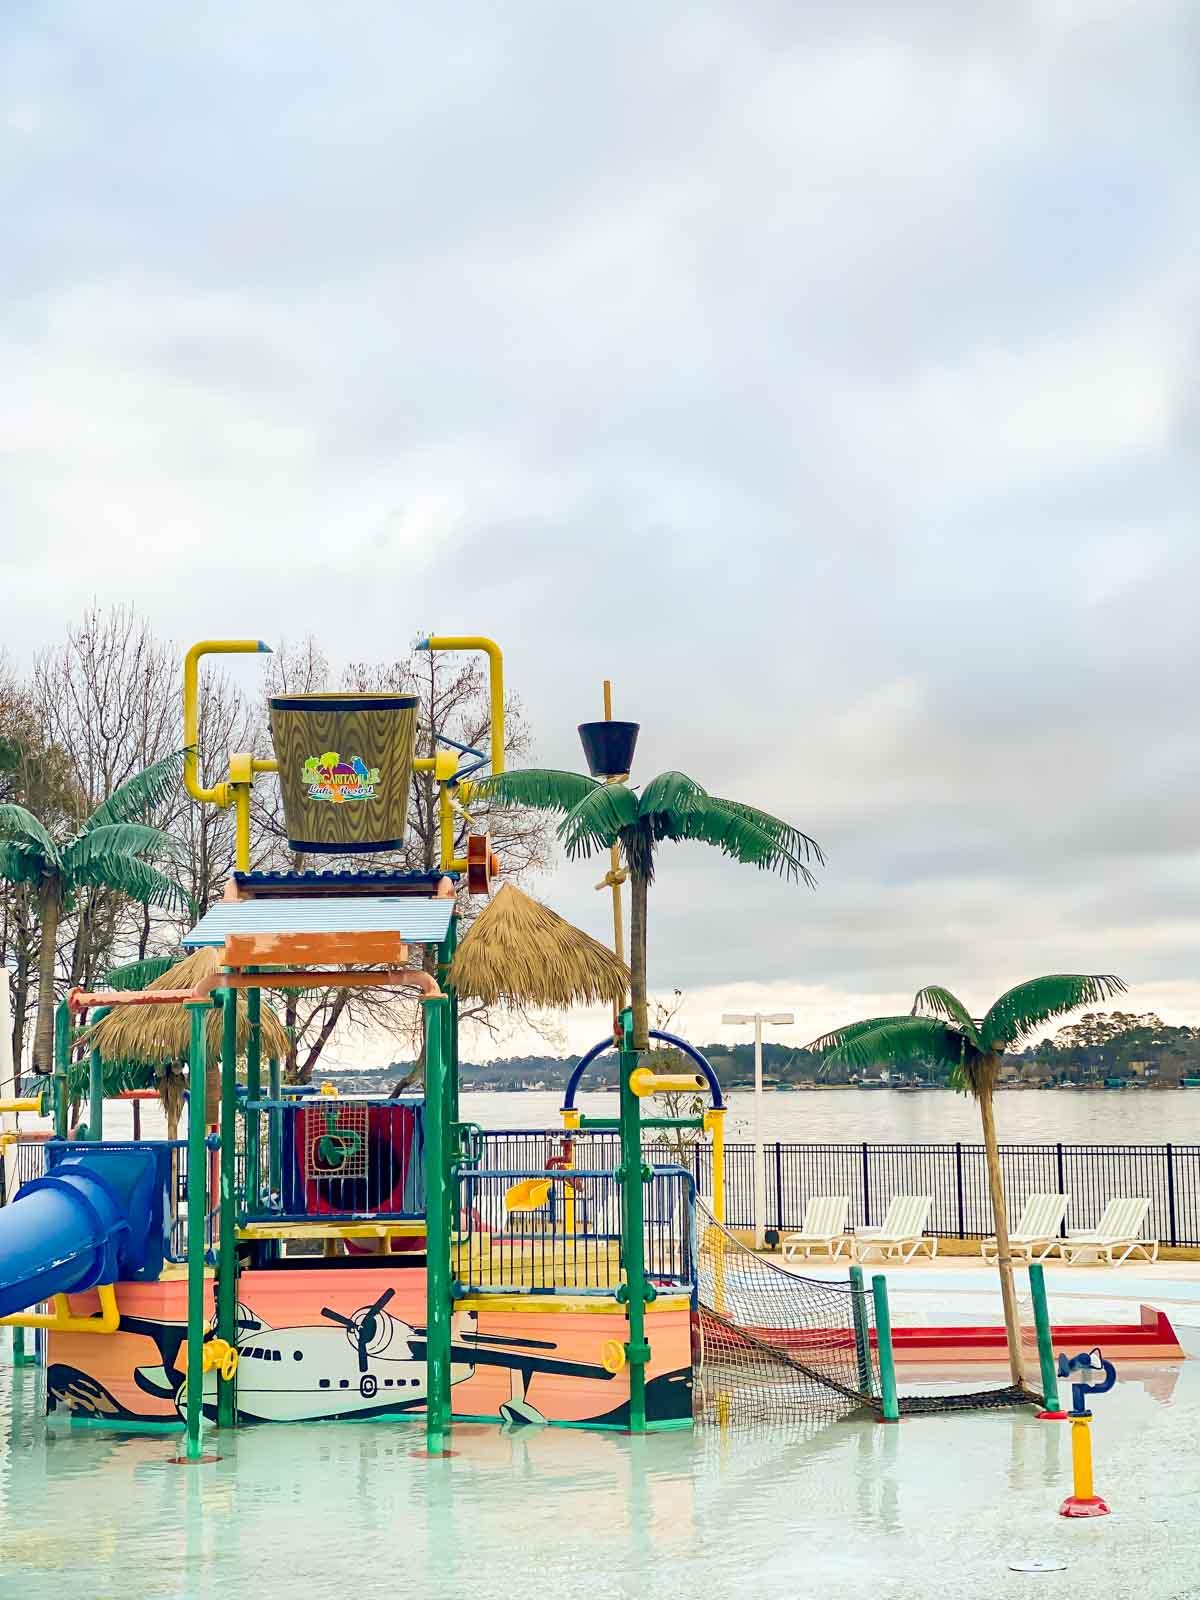 Splash park at Margaritaville Lake Conroe